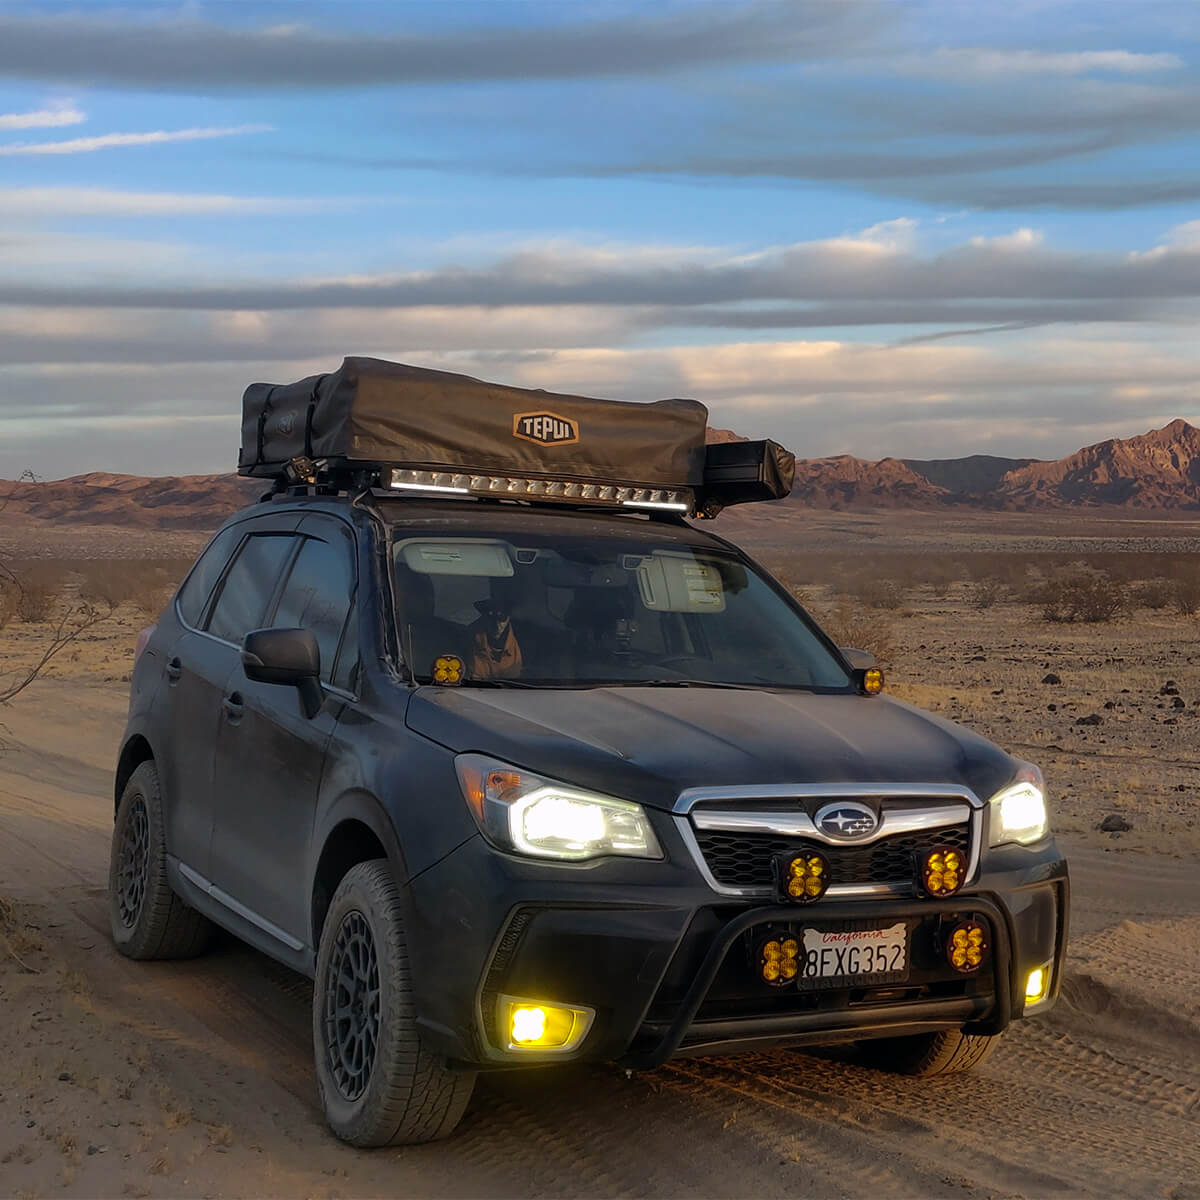 Subaru Forester SJ LED light bar and amber driving lights